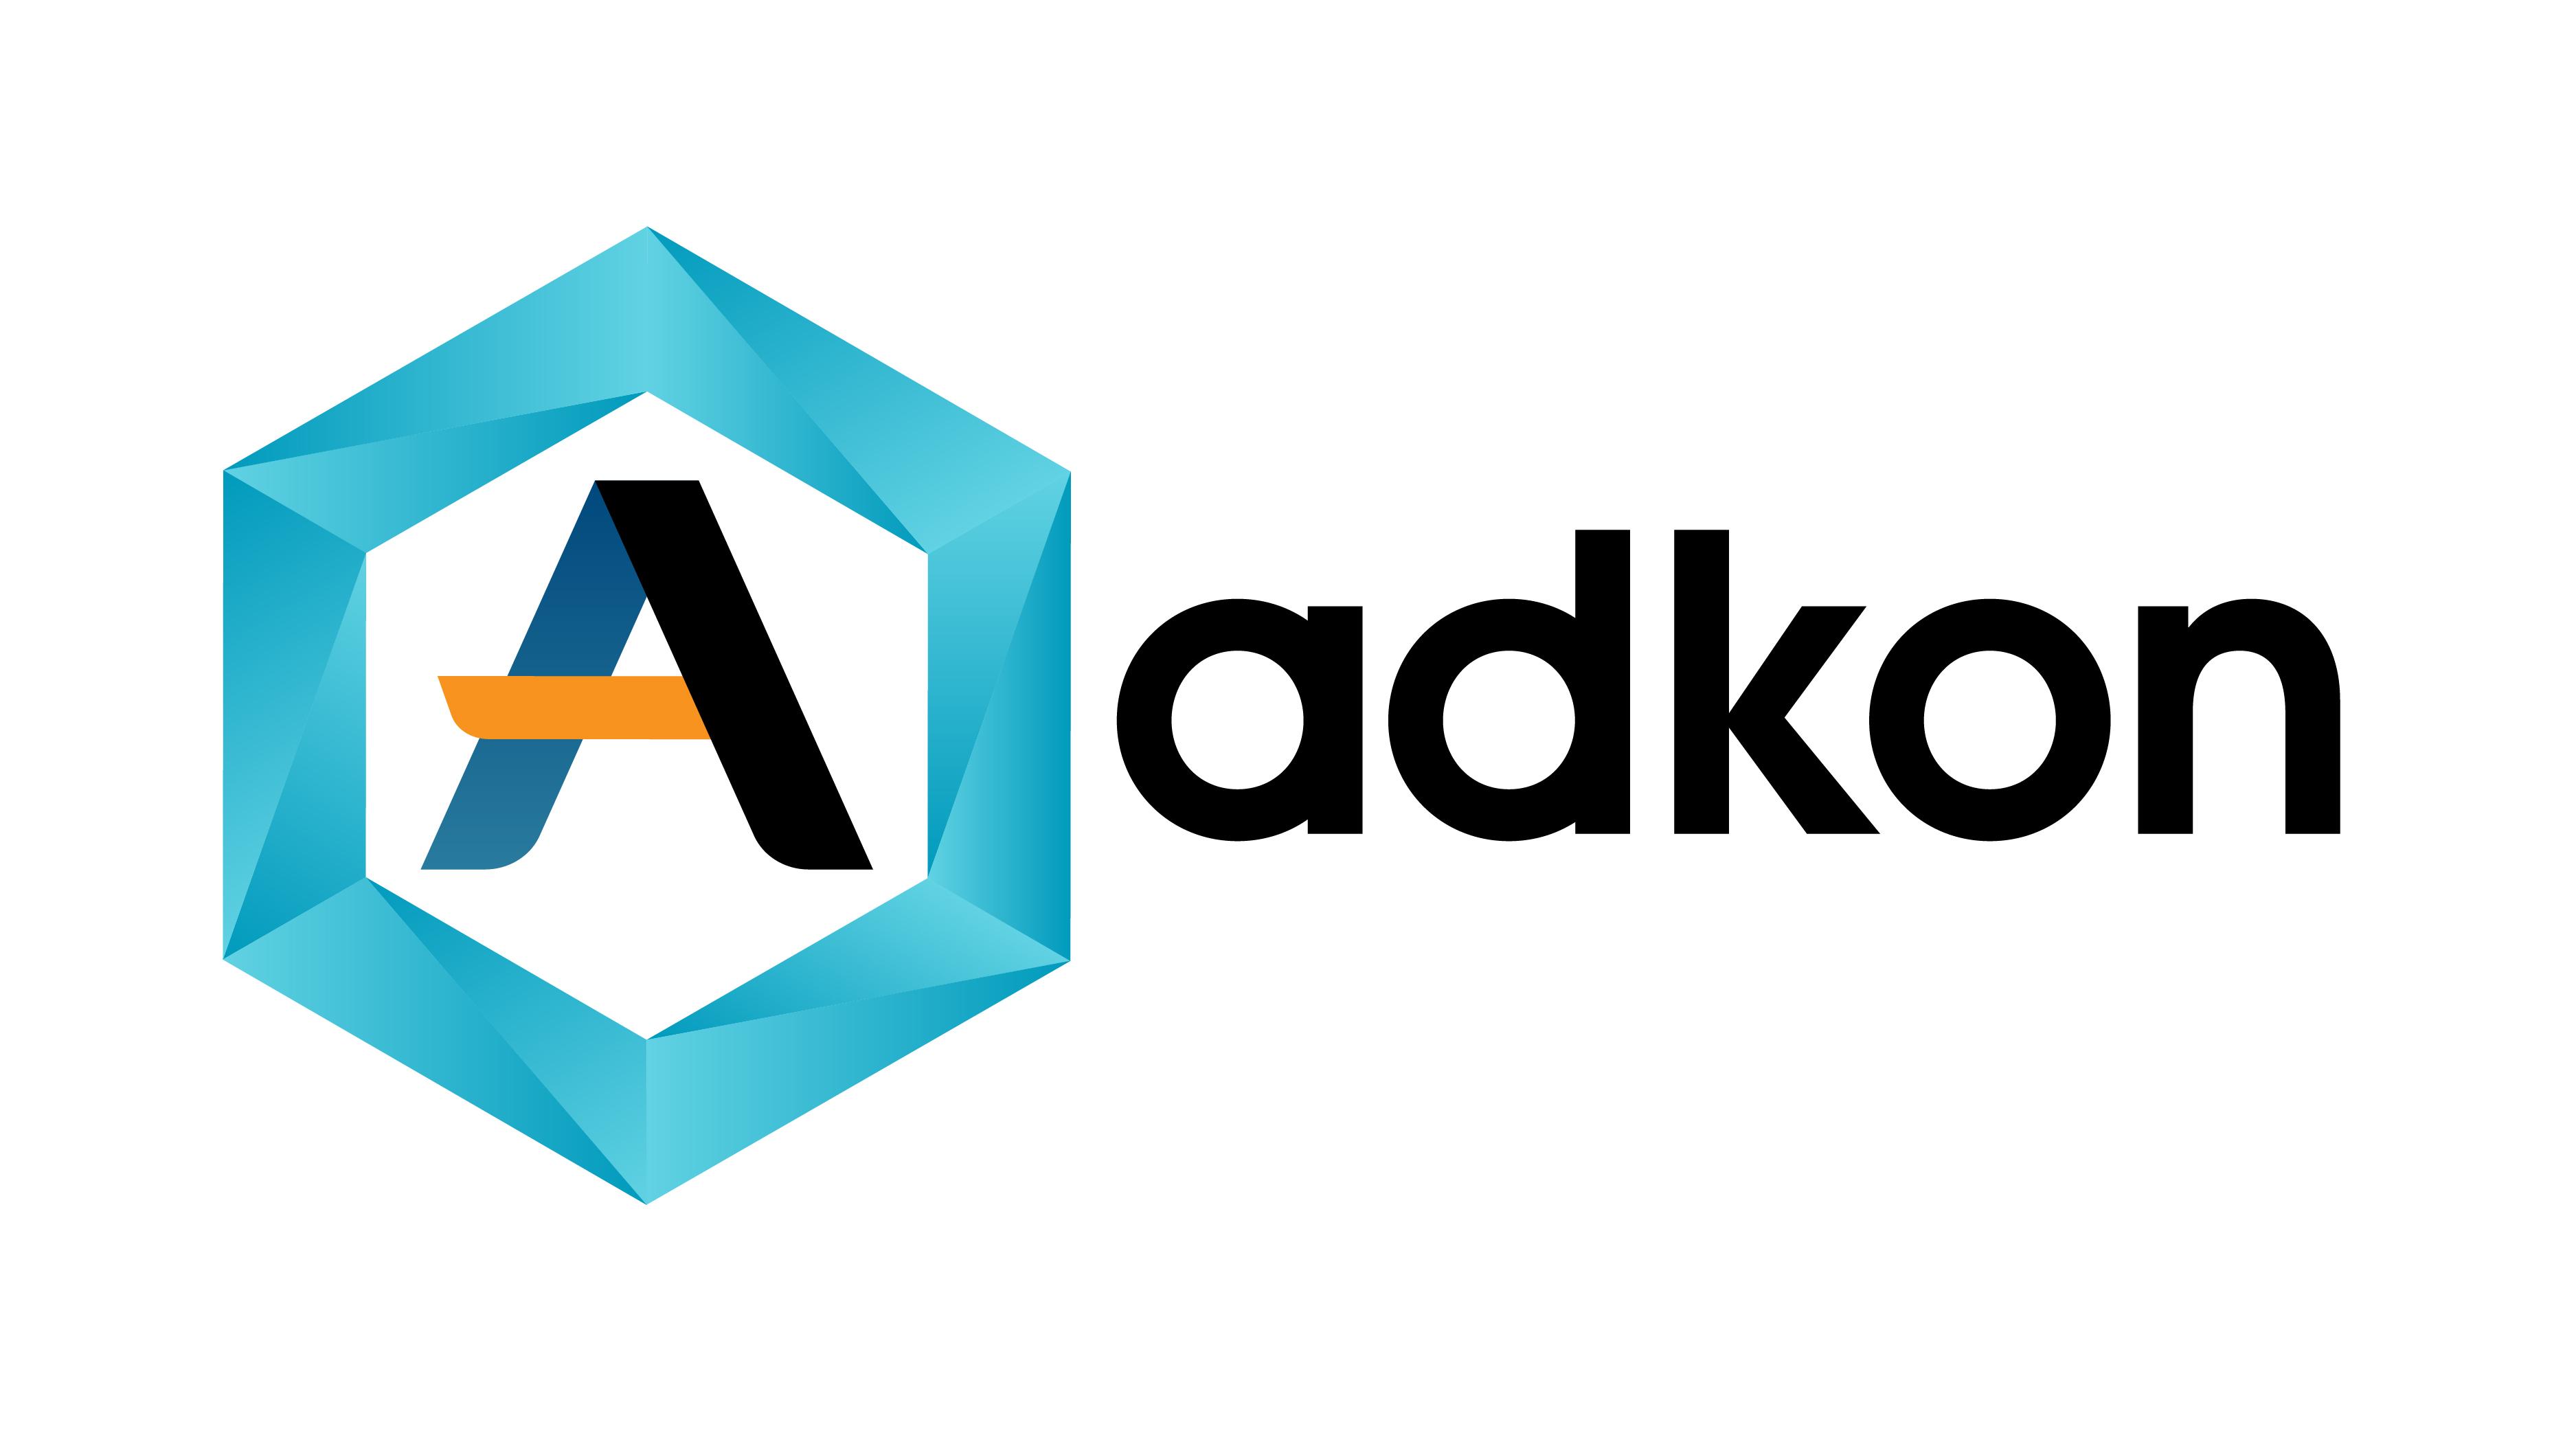 Разработка логотипа для компании фото f_4735967cf8336bb0.jpg